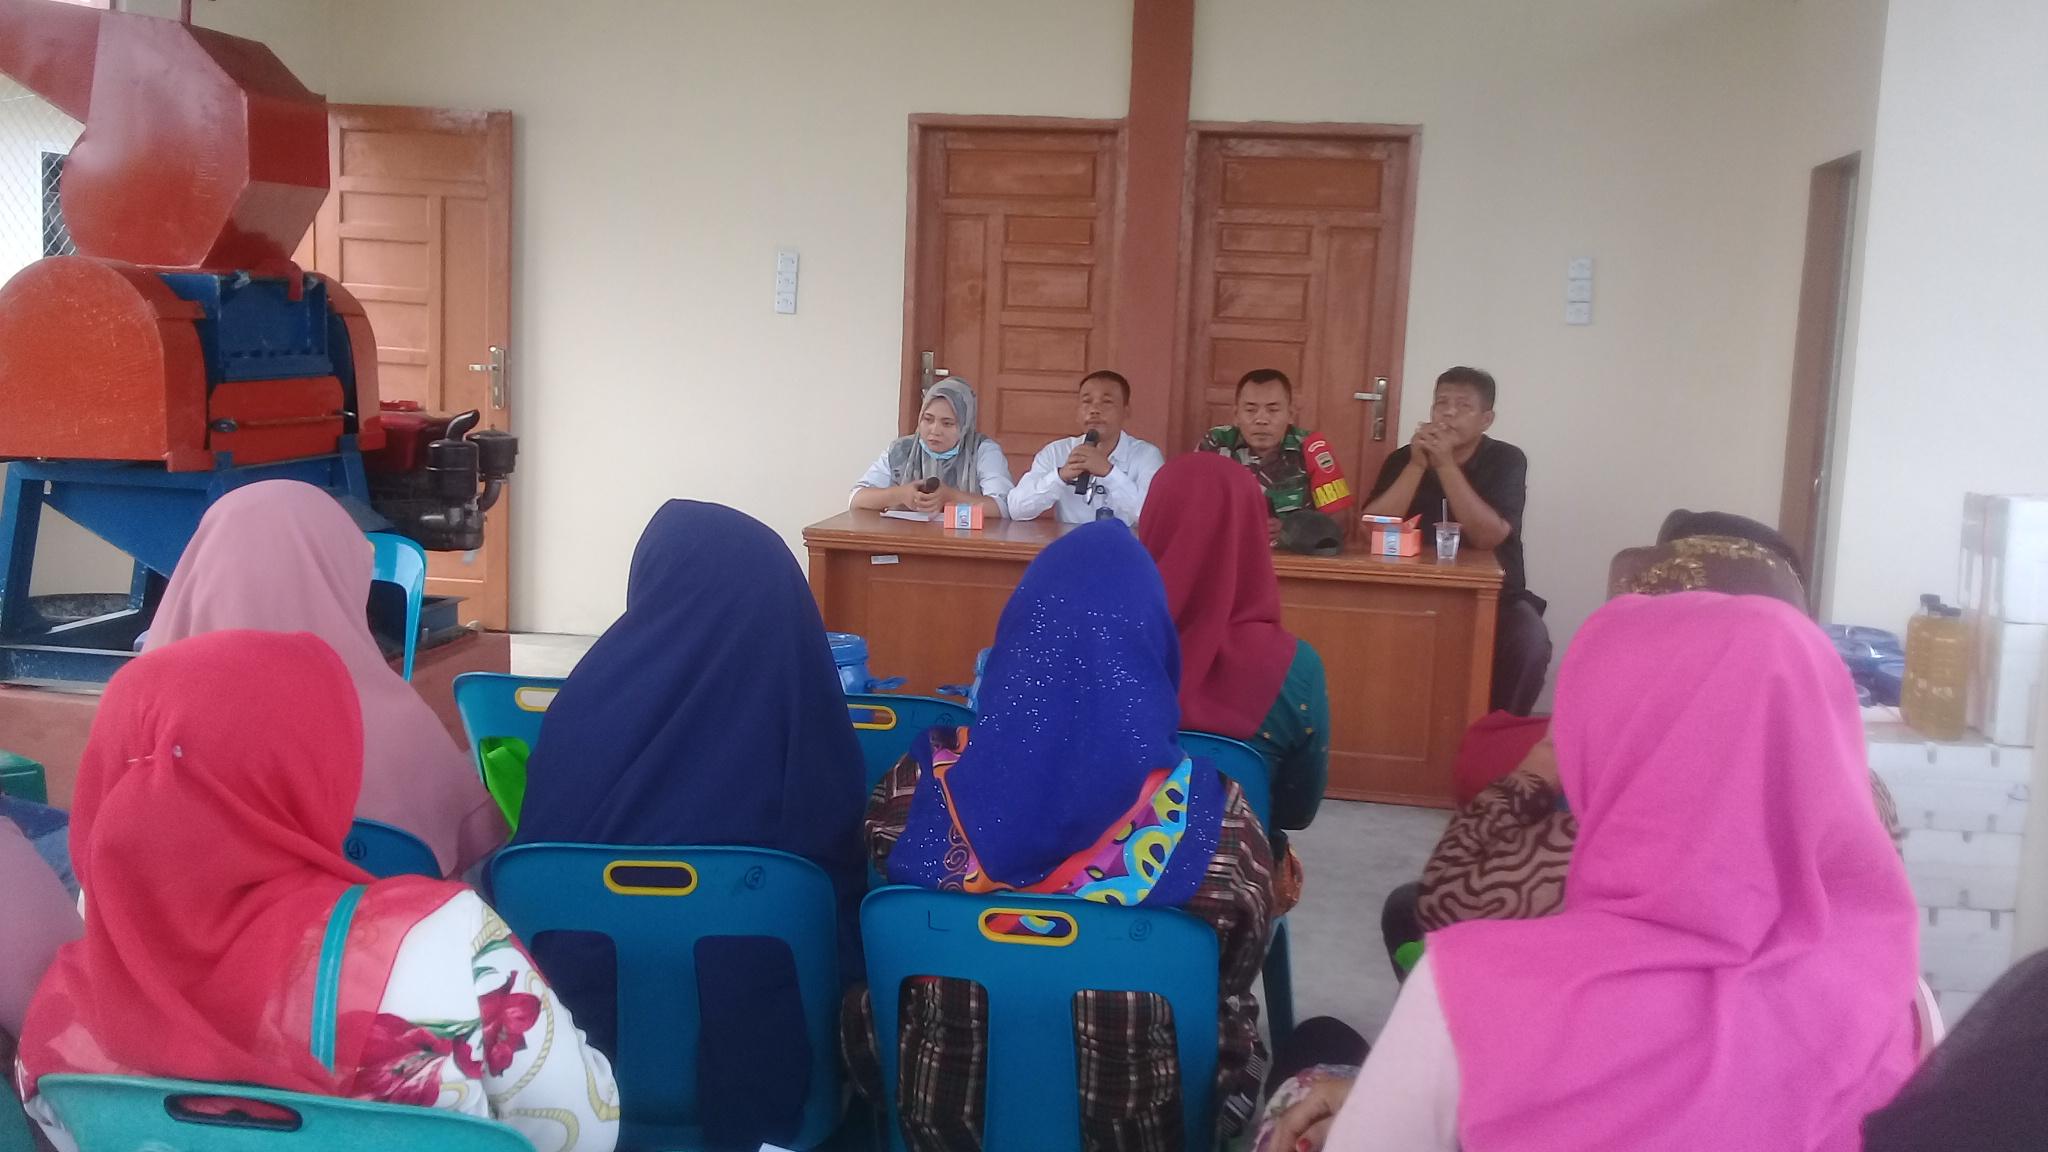 Kelurahan Lalang Buat Pelatihan Pupuk Kompos dan Pemanfaatan Limbah Sampah